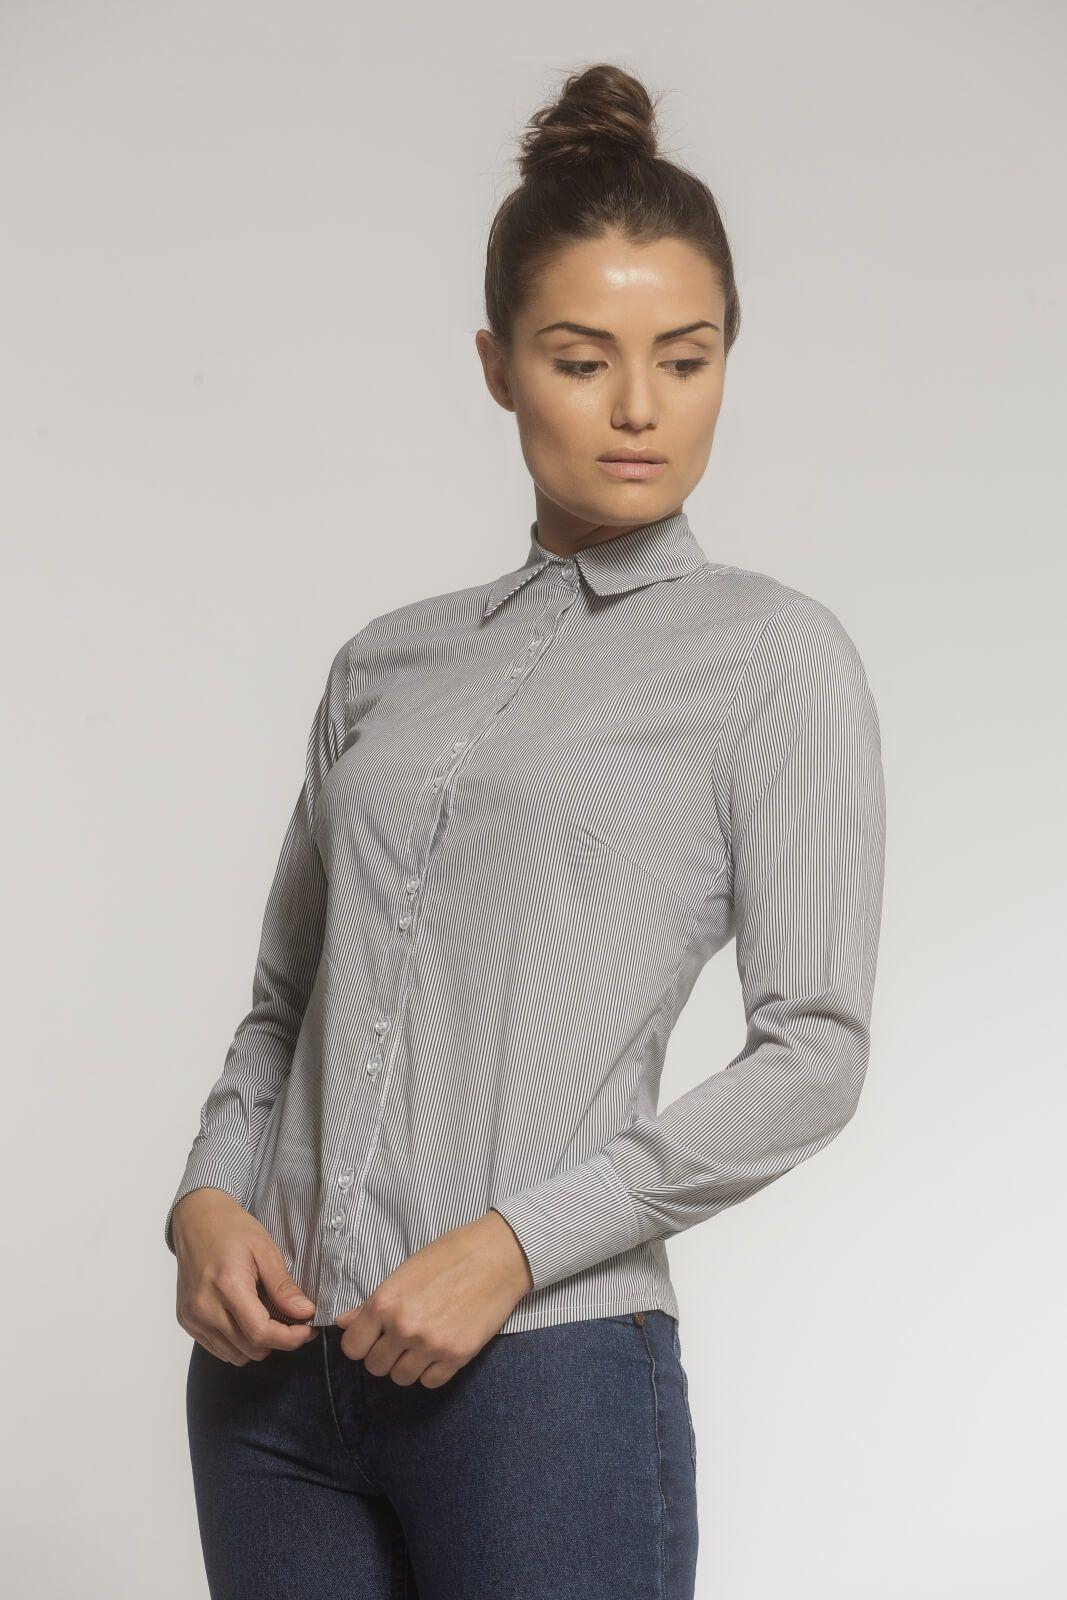 Camisa Feminina Alfaiataria Tradicional Tricoline Listrado Preto